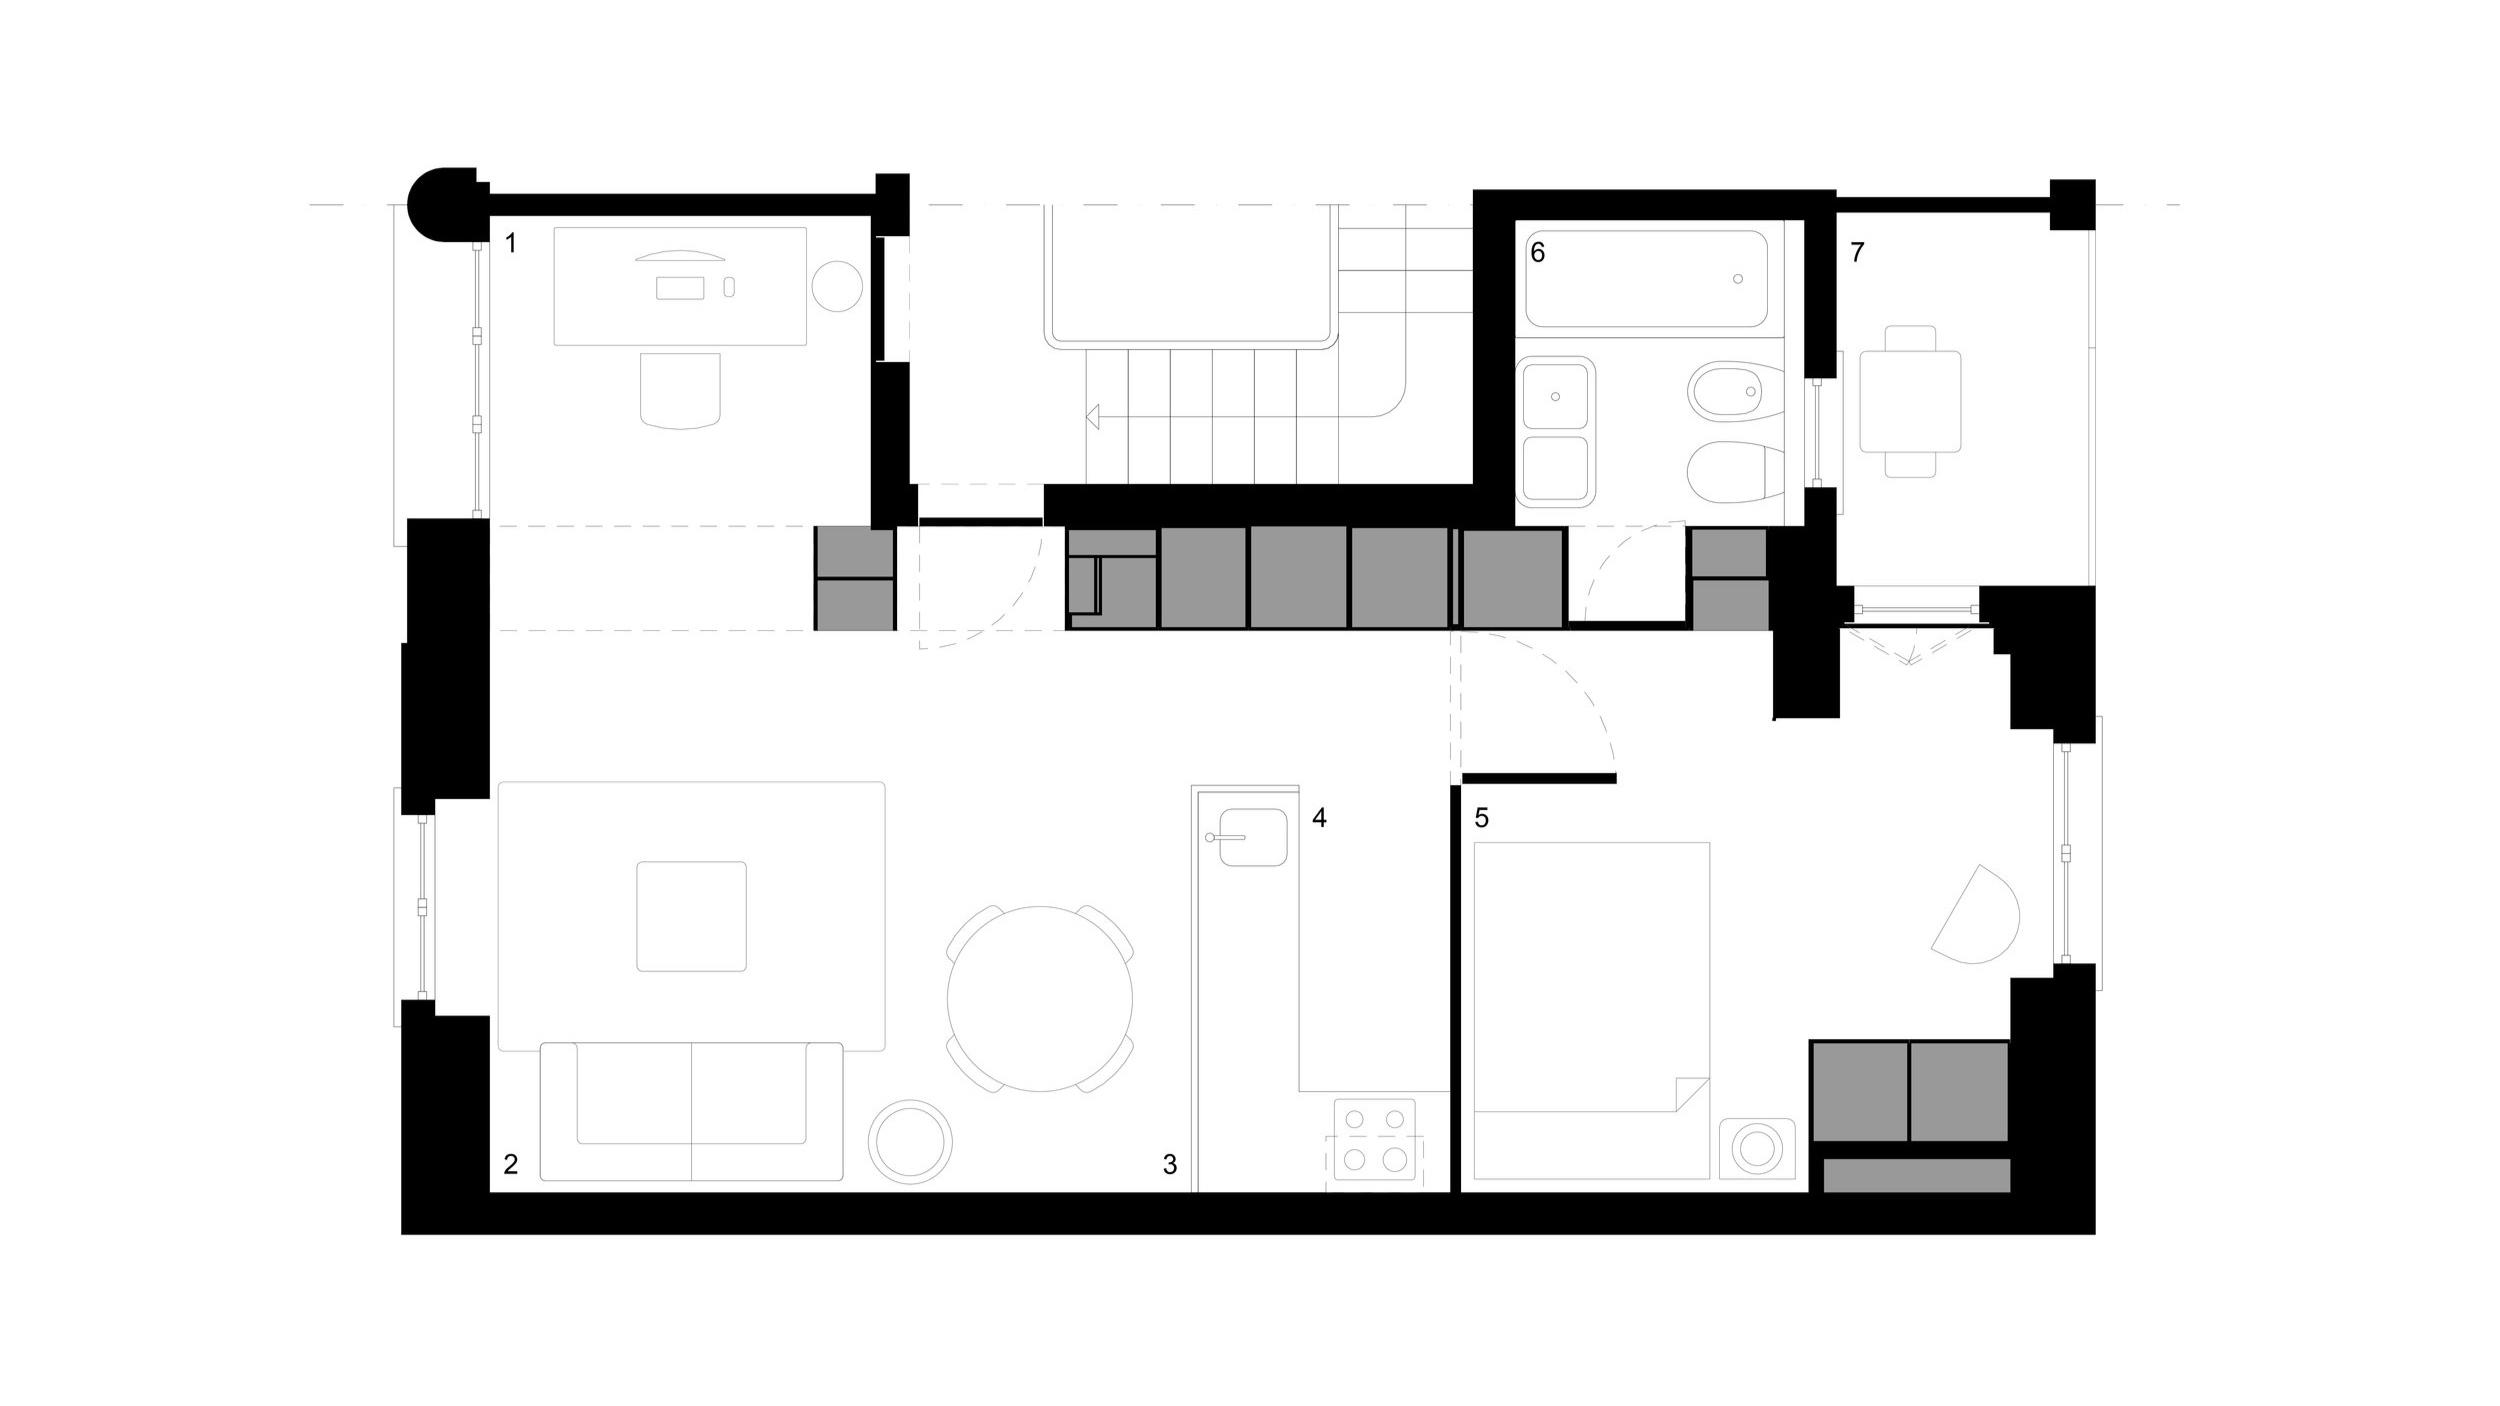 FLOOR PLAN _ 1 office . 2 living . 3 dining . 4 kitchenette . 5 bedroom . 6 bathroom . 7 balcony